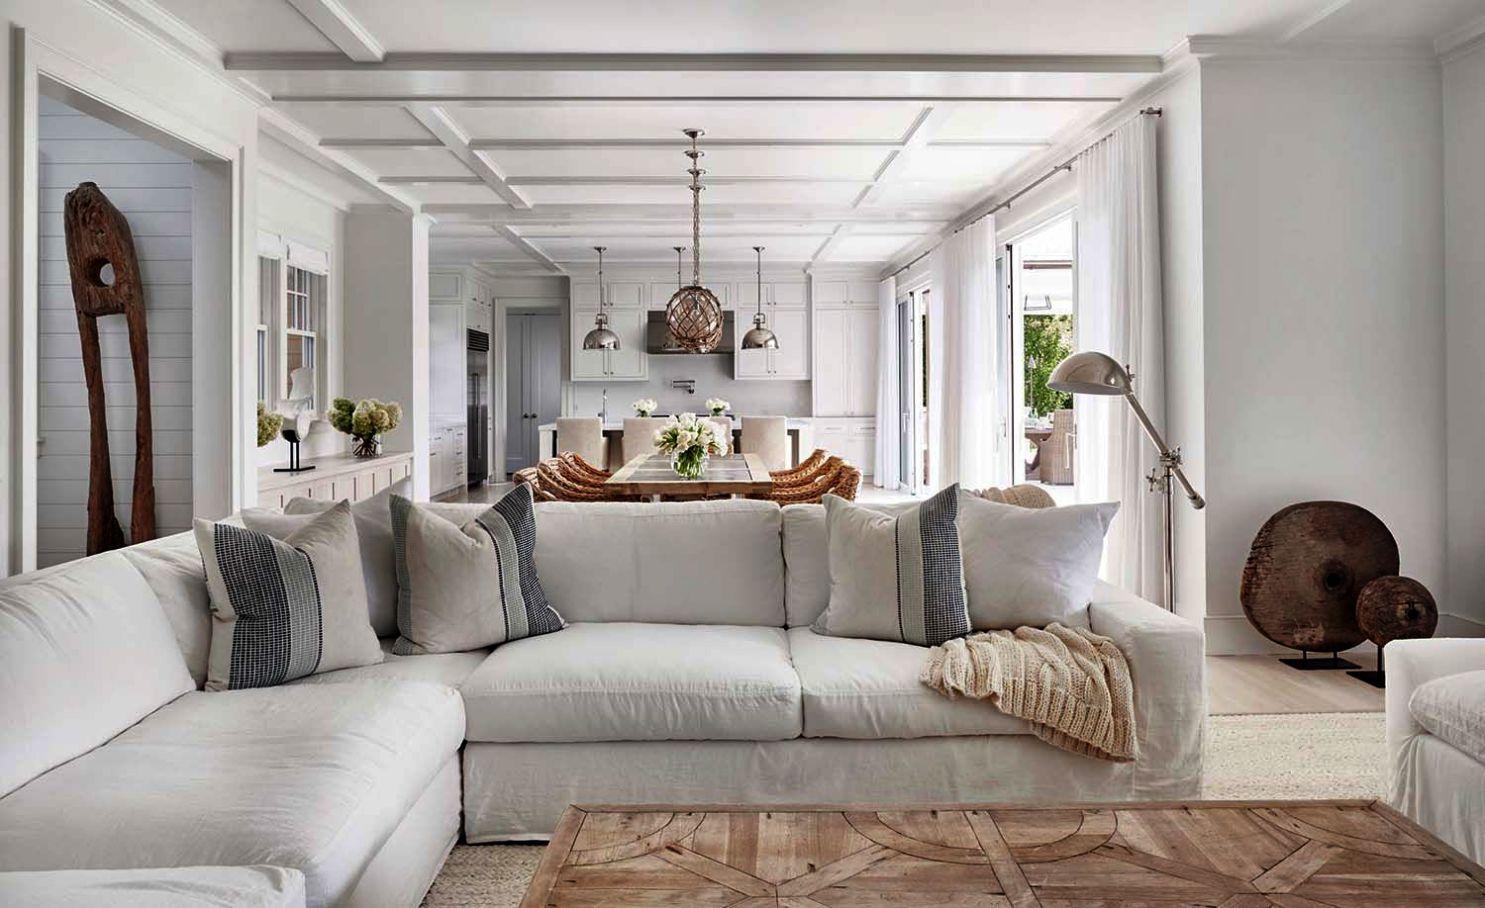 Home Decor Ideas Green Beneath Home Decor Ideas Instagram Past